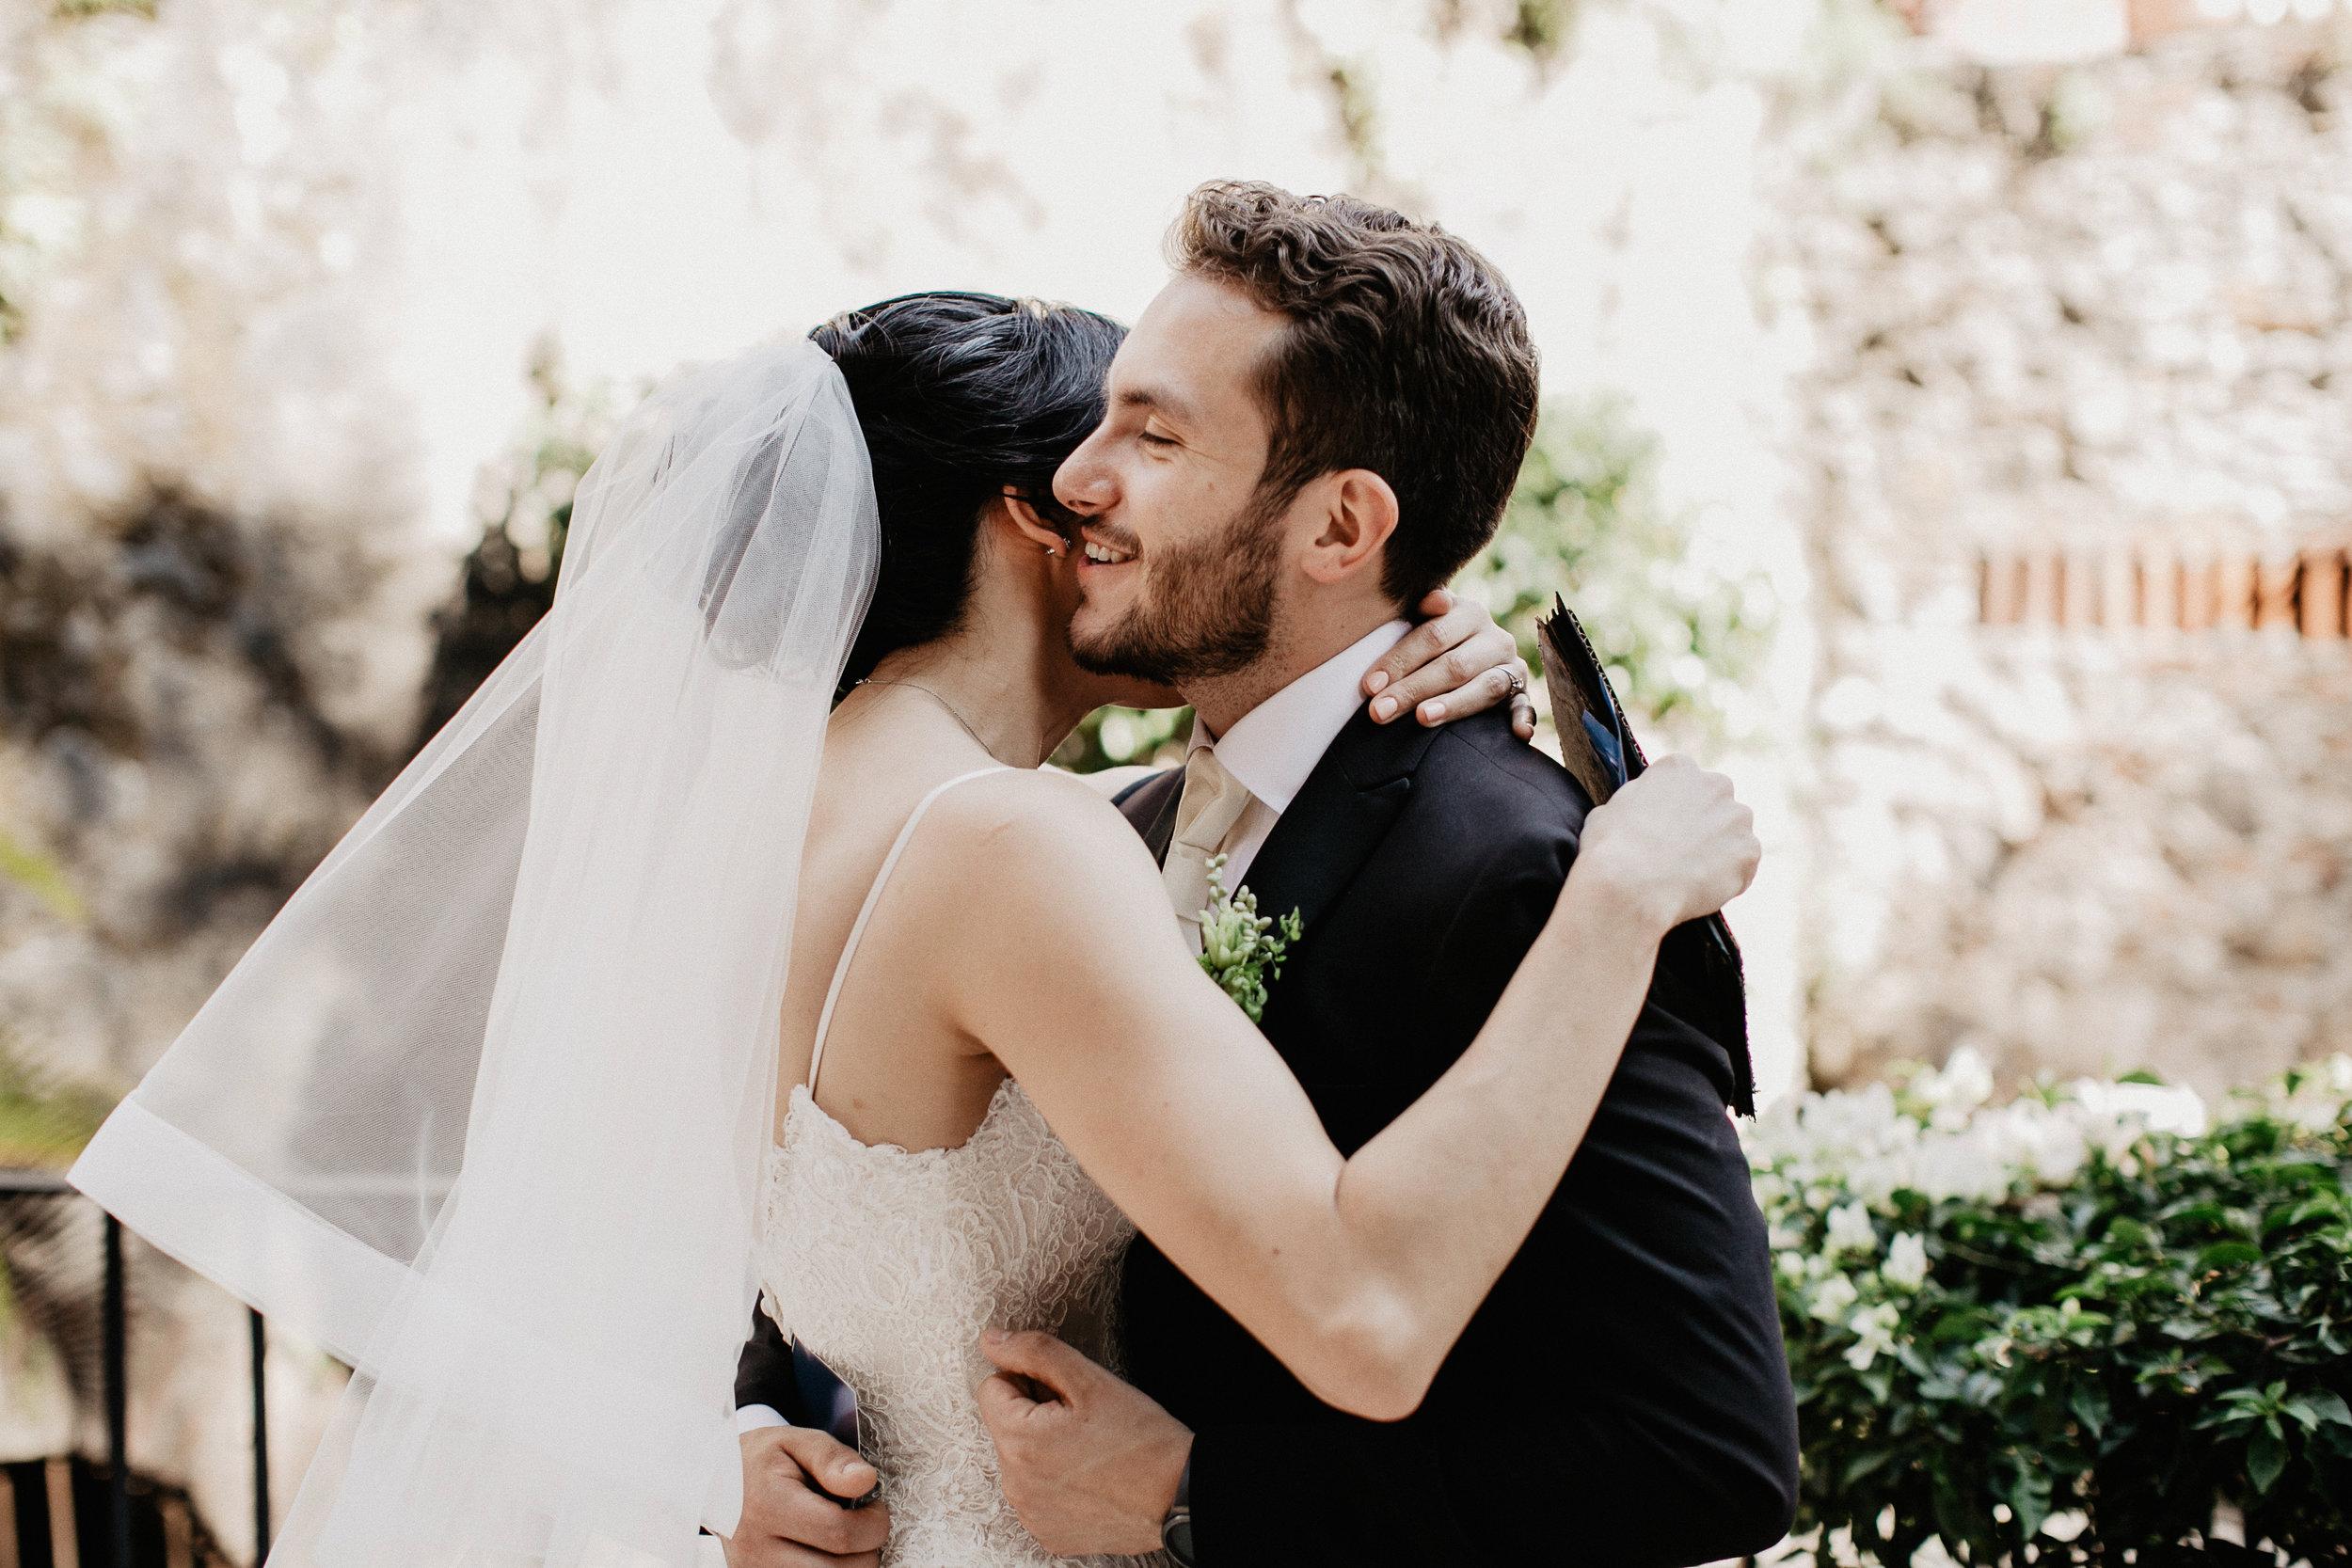 Alfonso_flores_destination_wedding_photography_vanesa_carlos-299.JPG